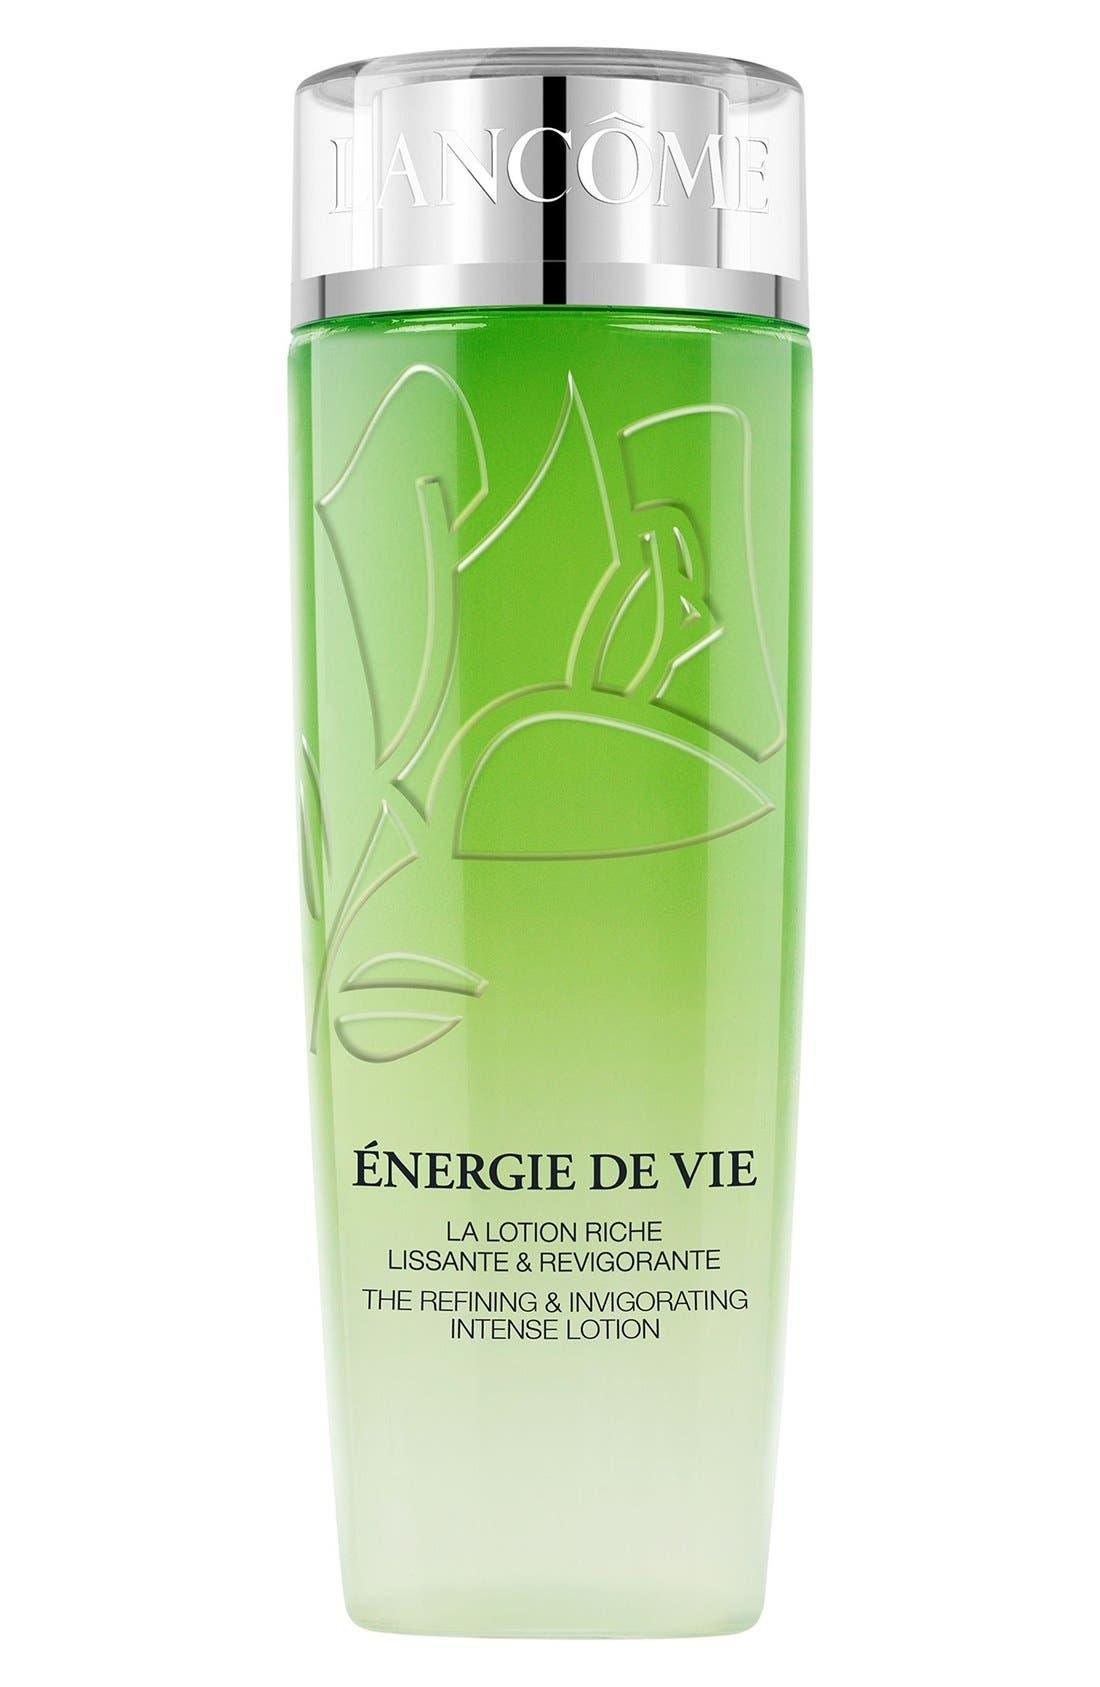 Lancome Energie De Vie Intense Essence